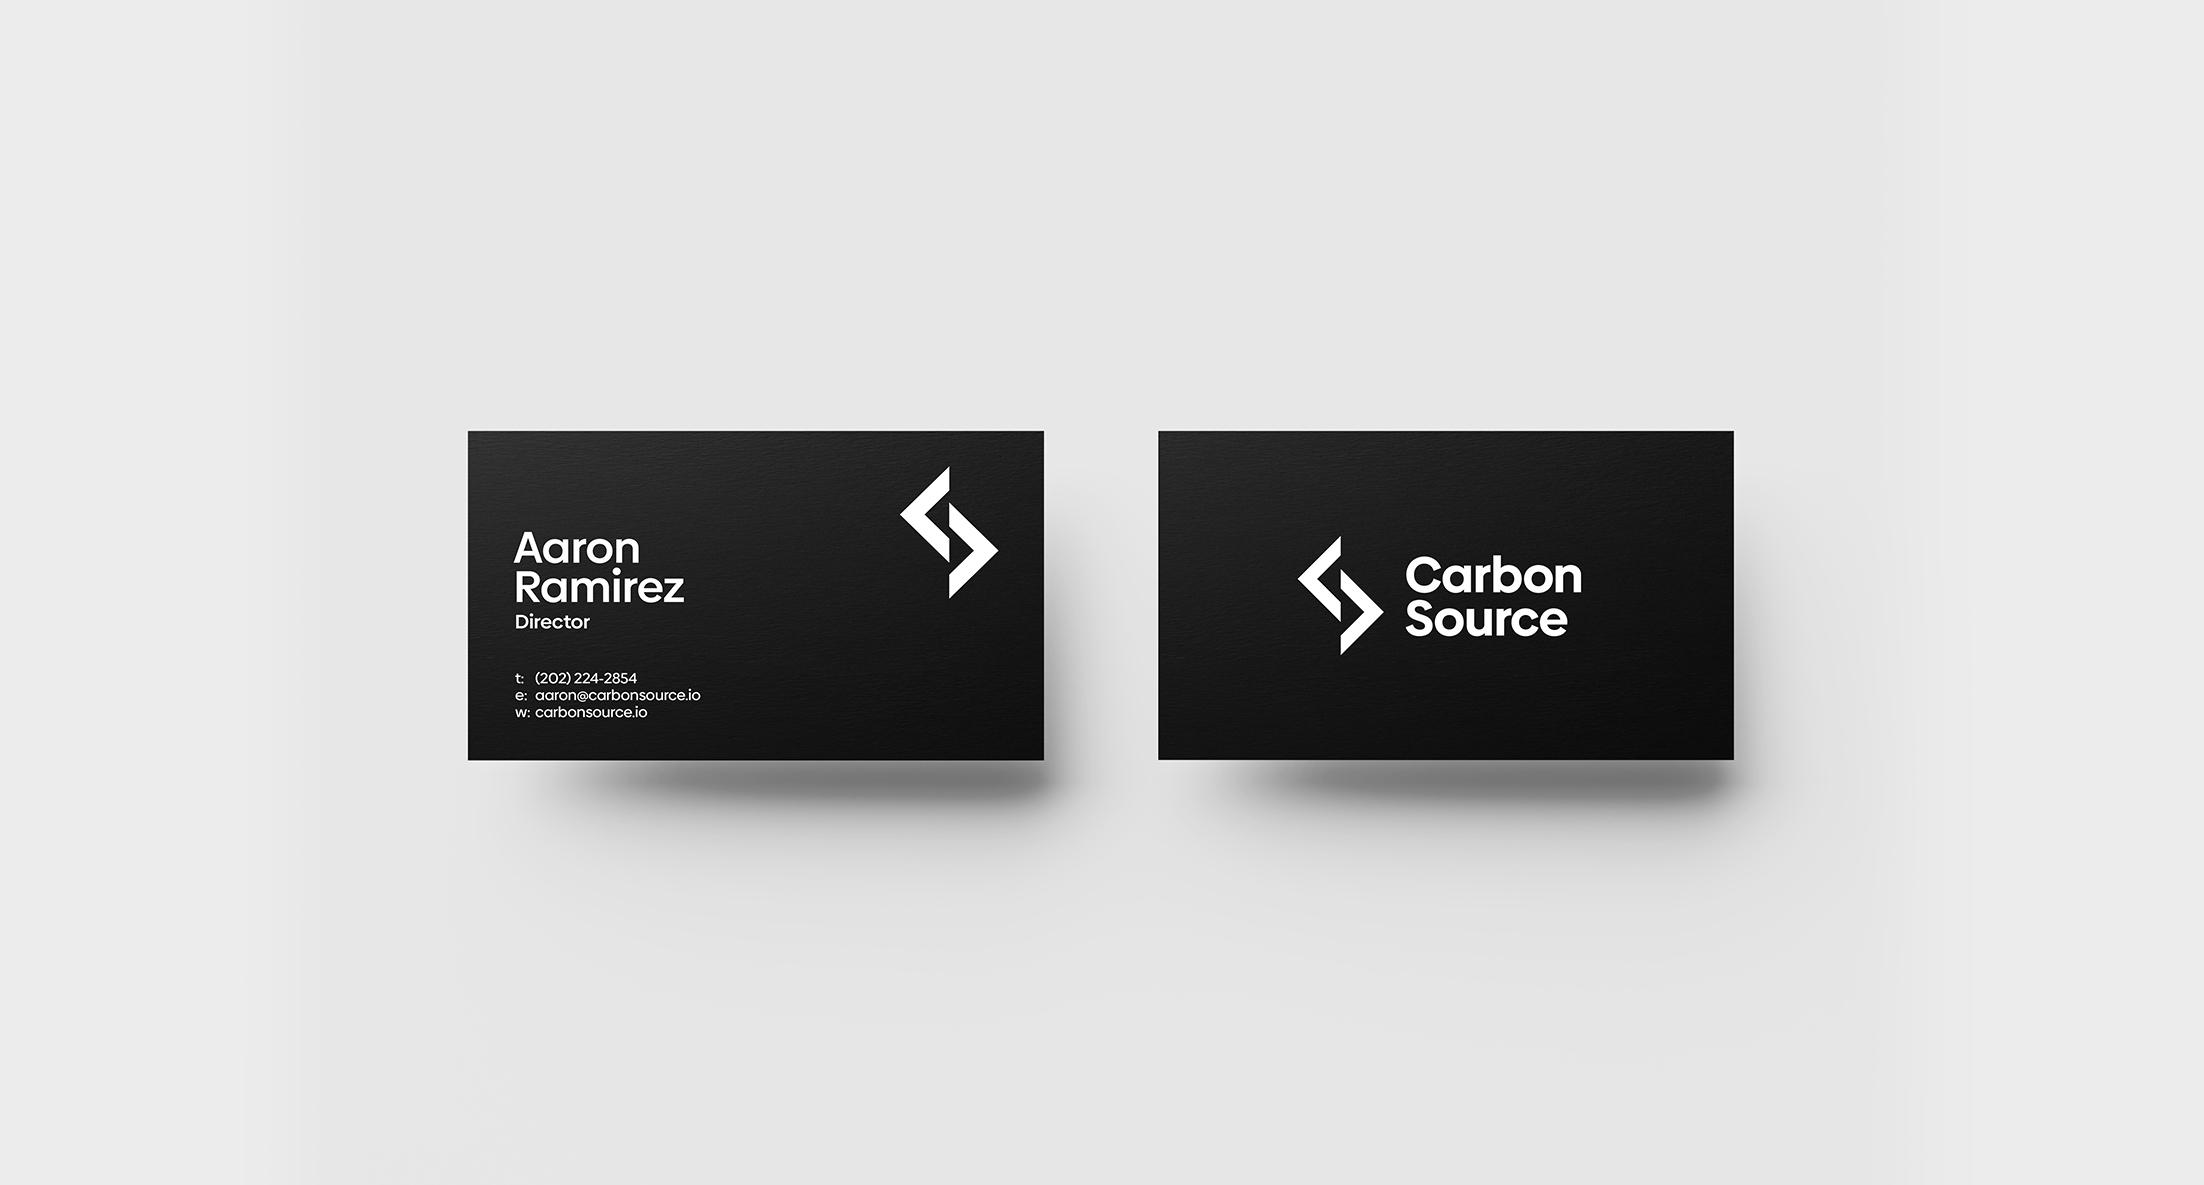 Carbon Source by Dan Bailey